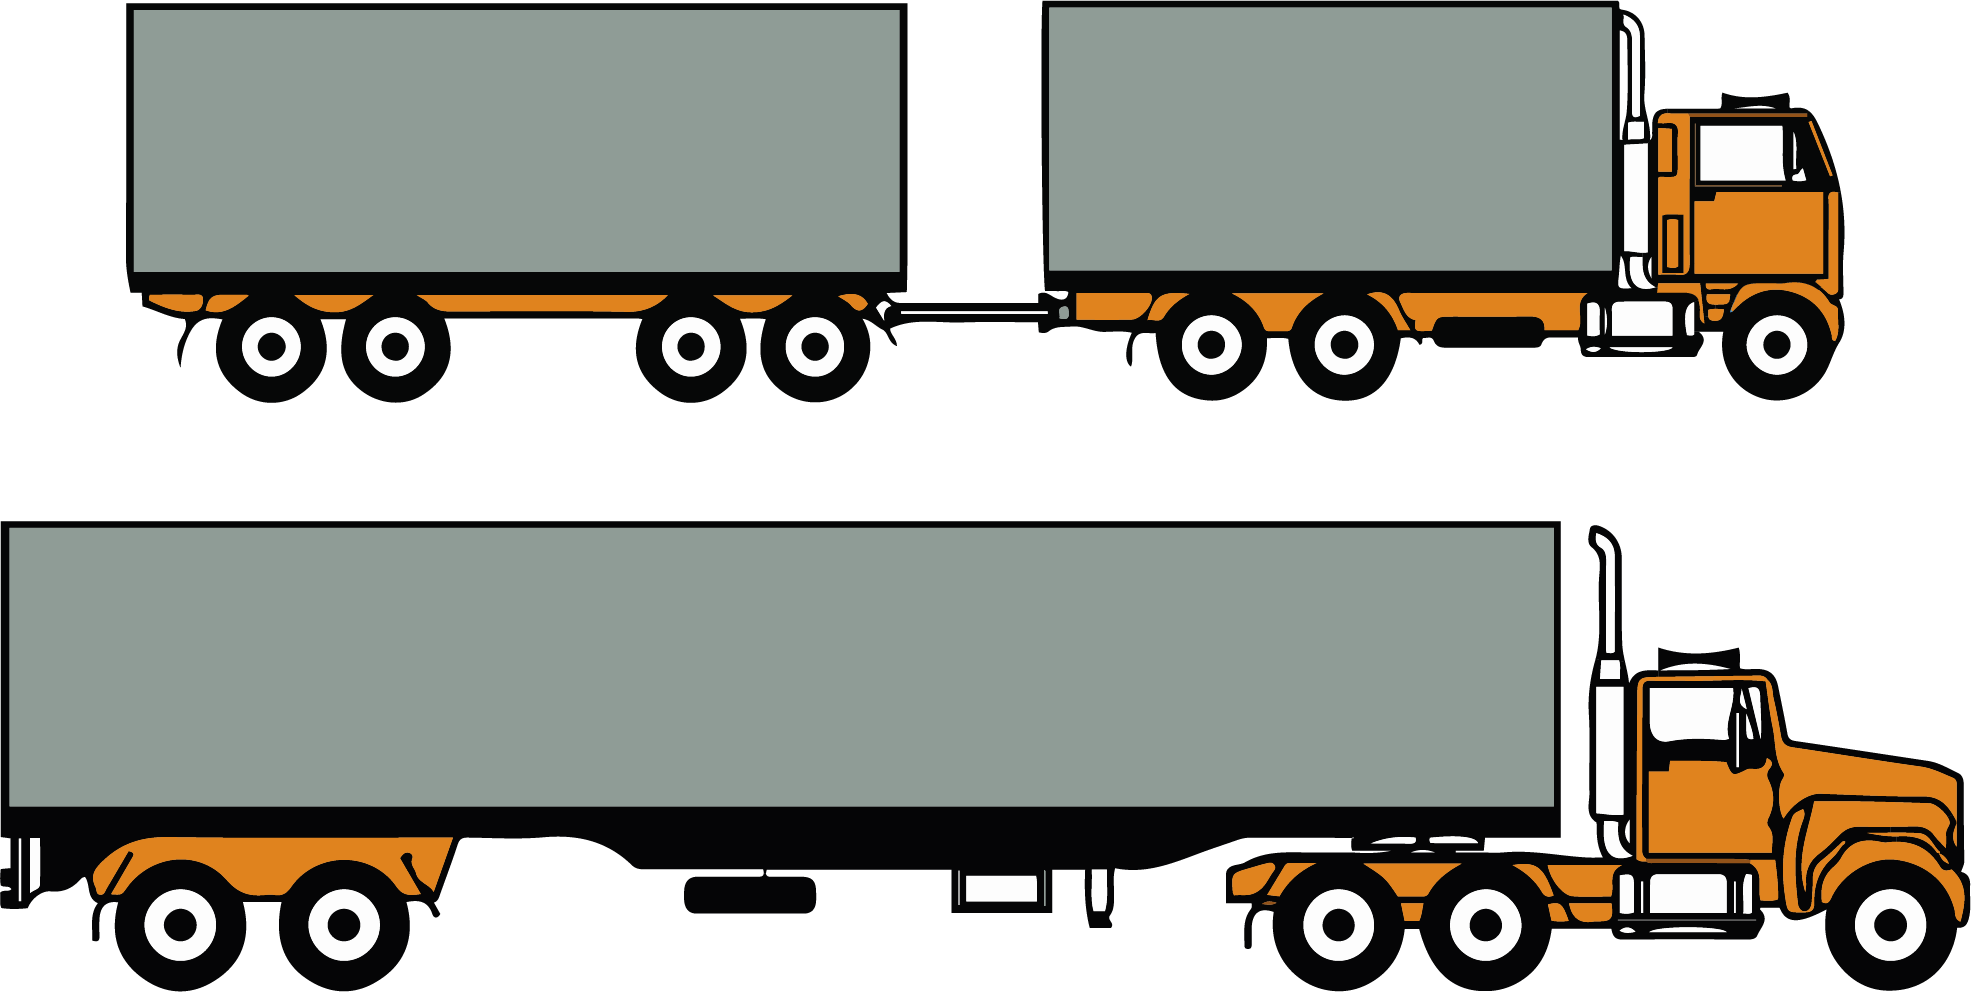 HC Vehicles